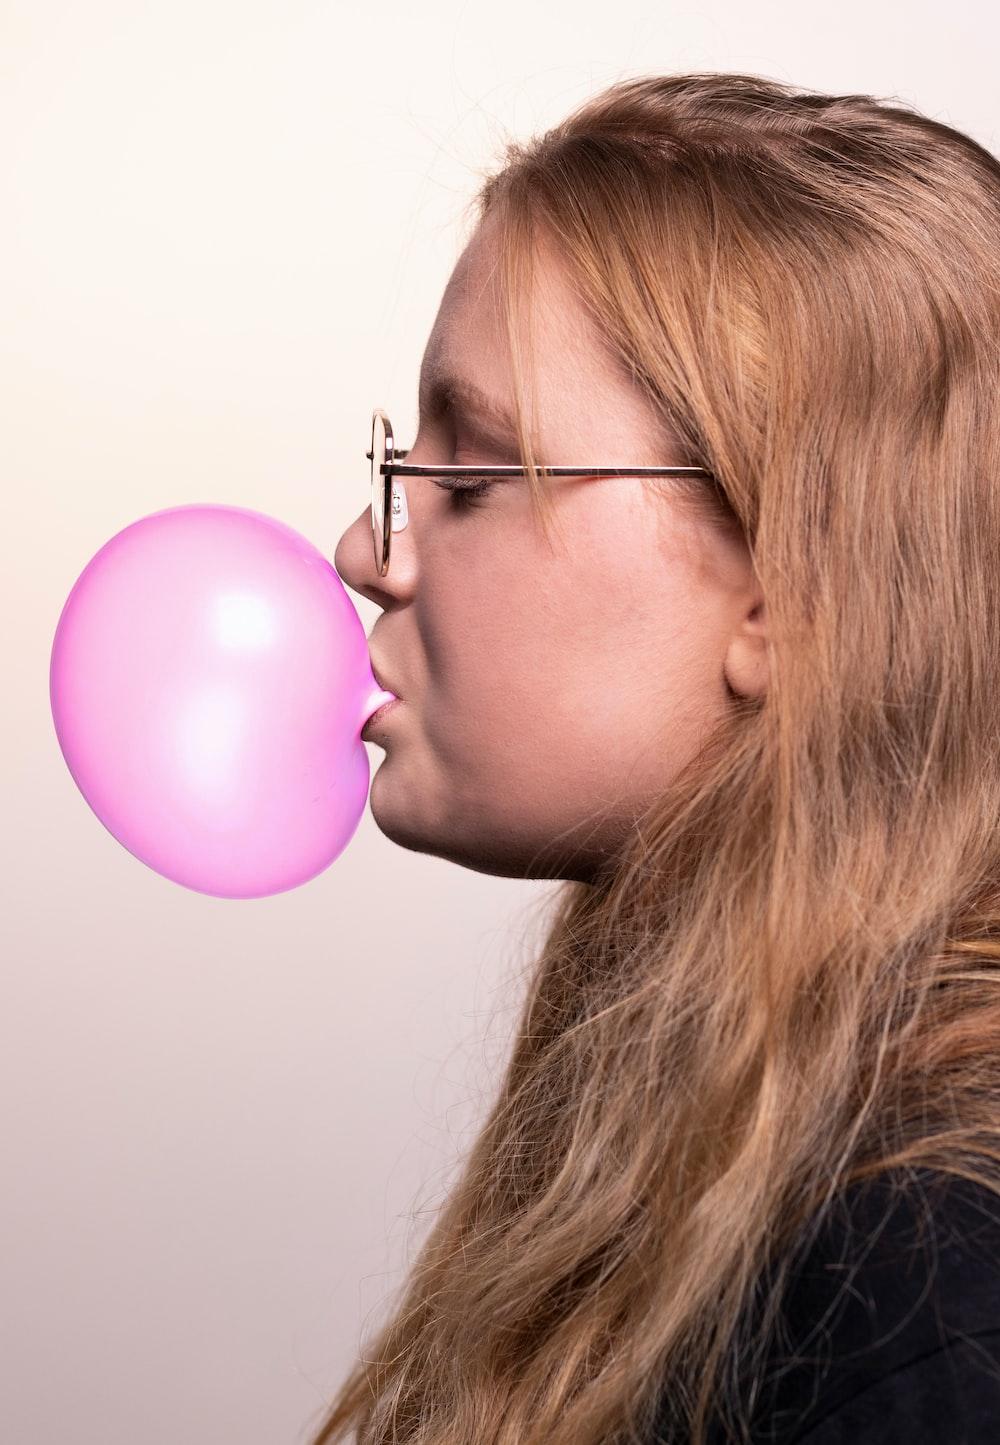 woman chewing bubblegum